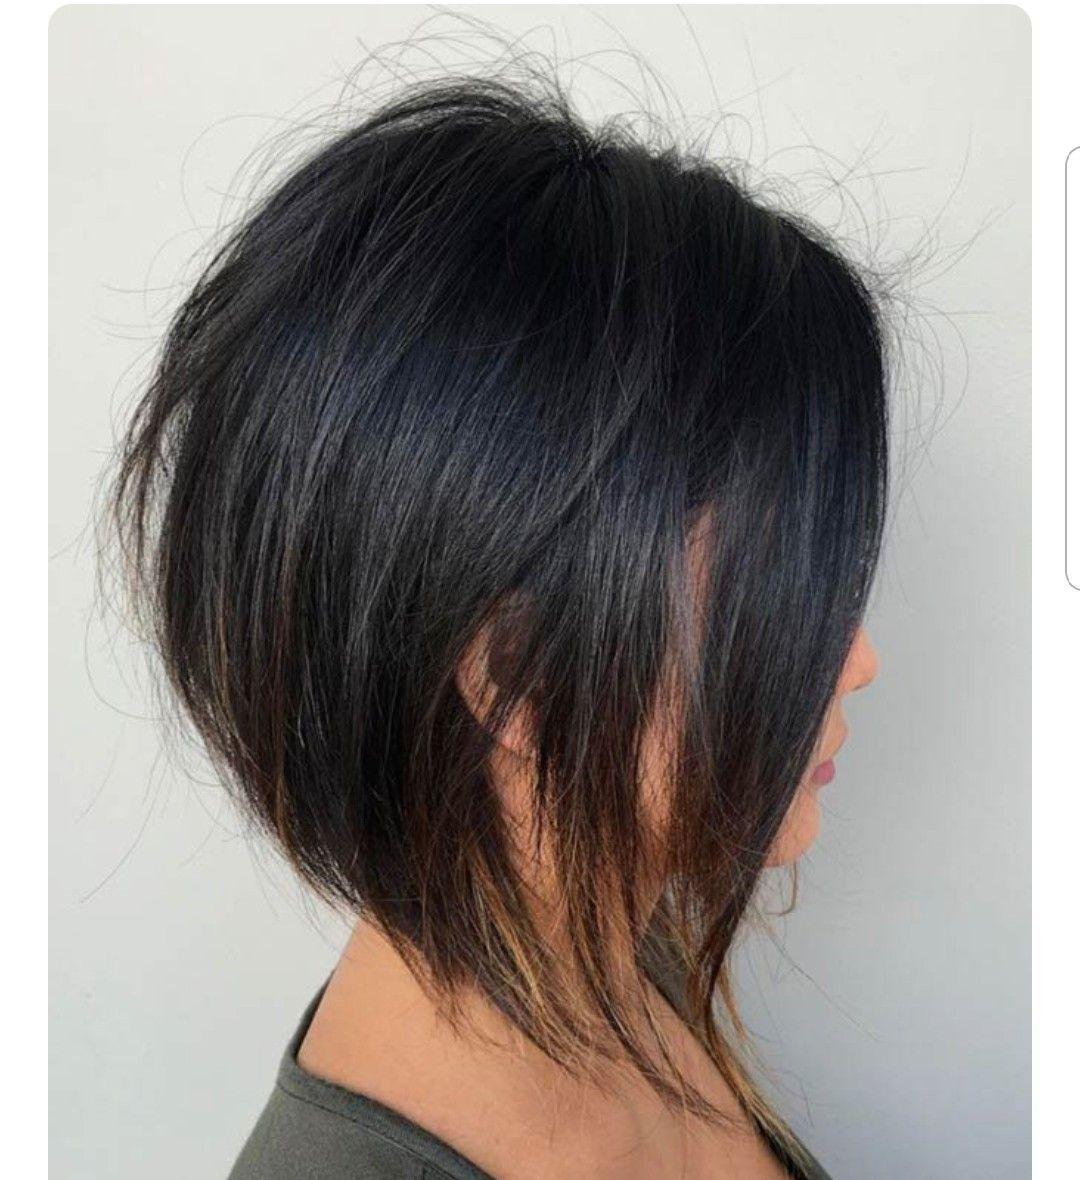 Pin by angele alvarez on hair pinterest hair styles hair and